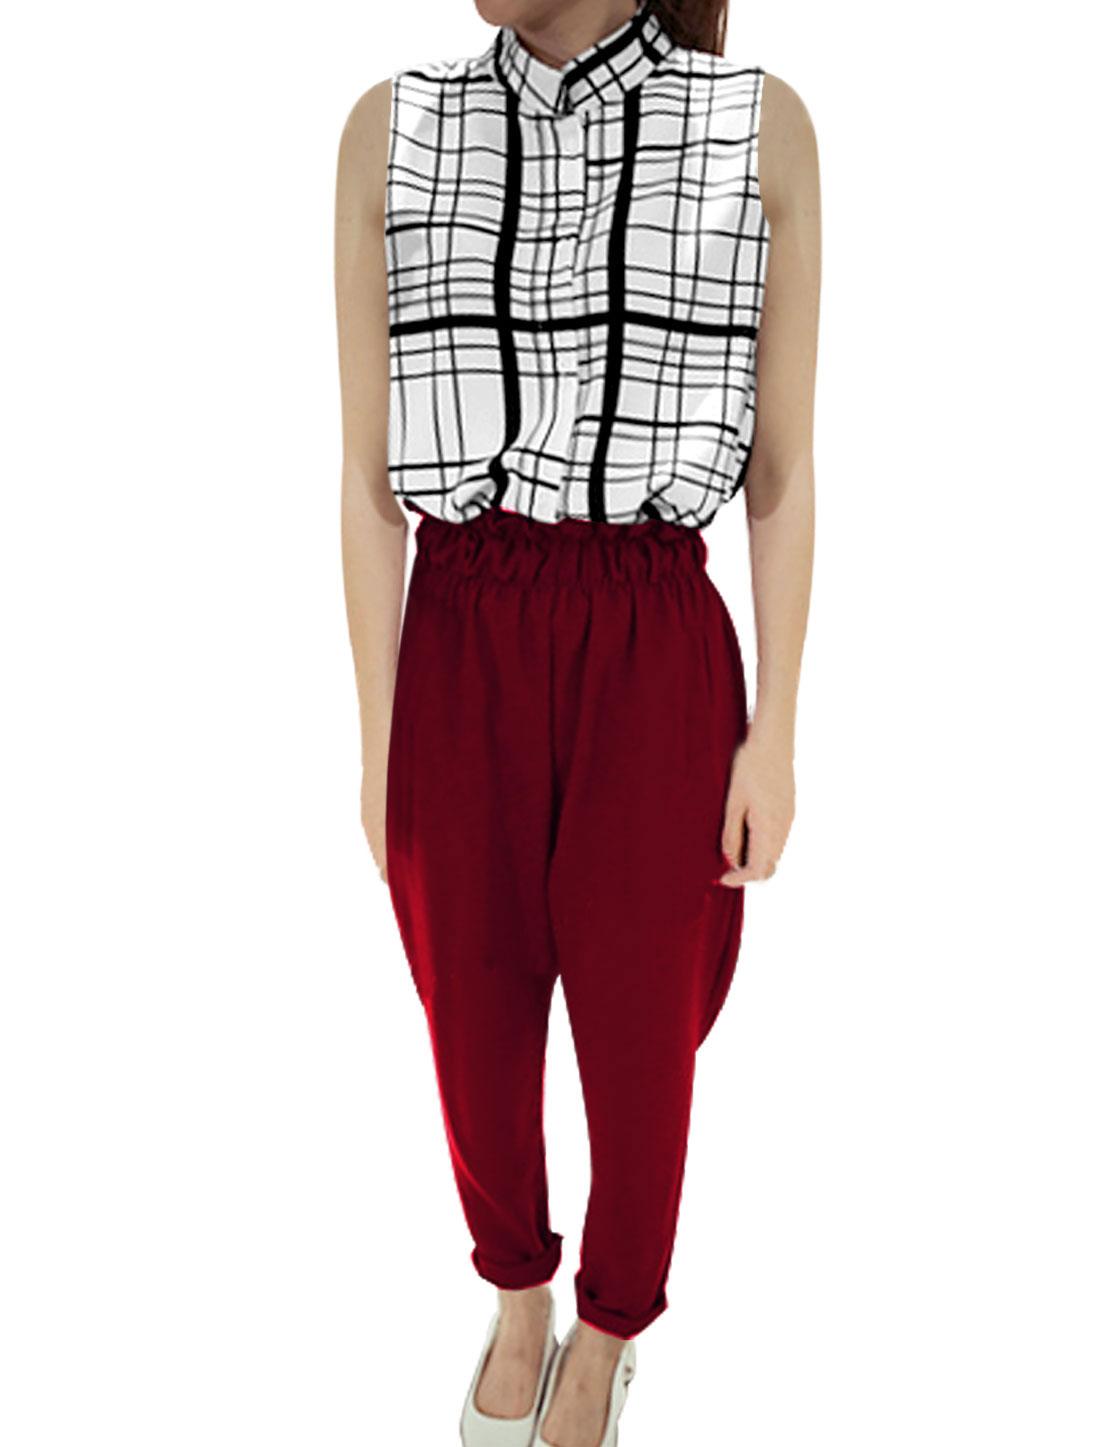 Women's Button Down Round Hem Plaids Shirt w Belt Loop Cropped Pants Burgundy XS